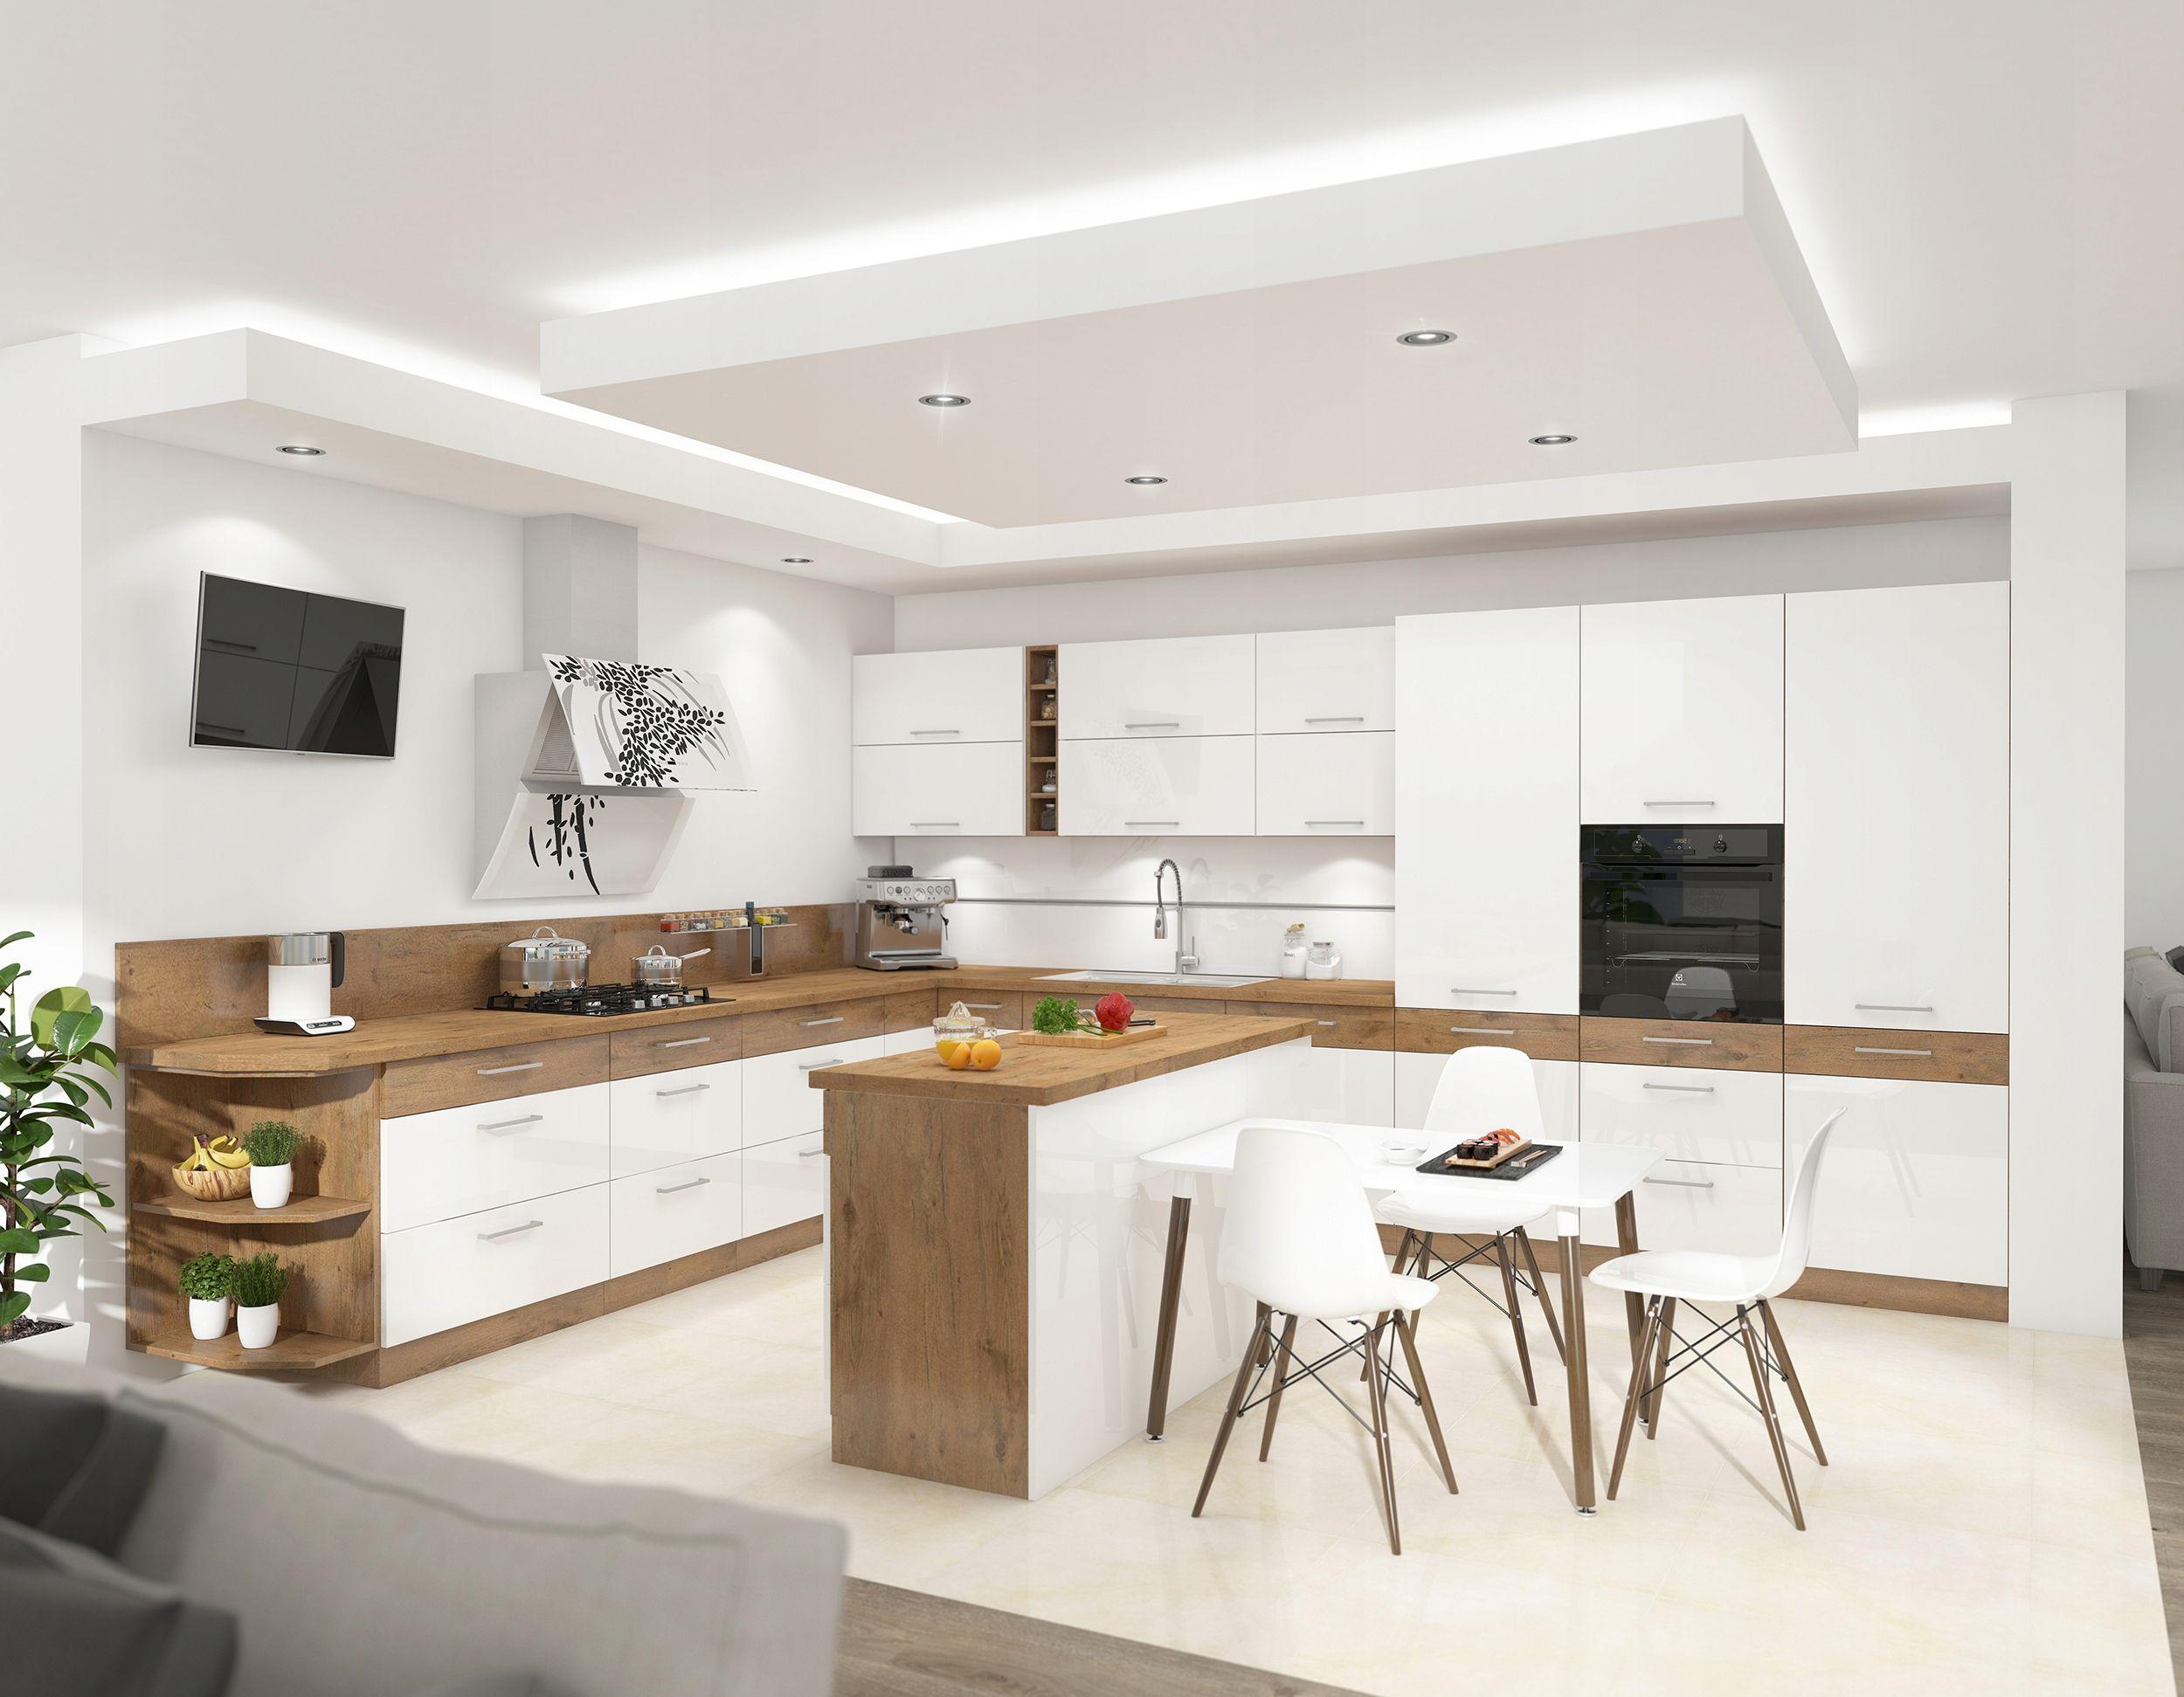 Meble Kuchenne Vario Iii Bialy Polysk Mdf Kuchnia Interior Design Kitchen Kitchen Interior Modern White Kitchen Cabinets